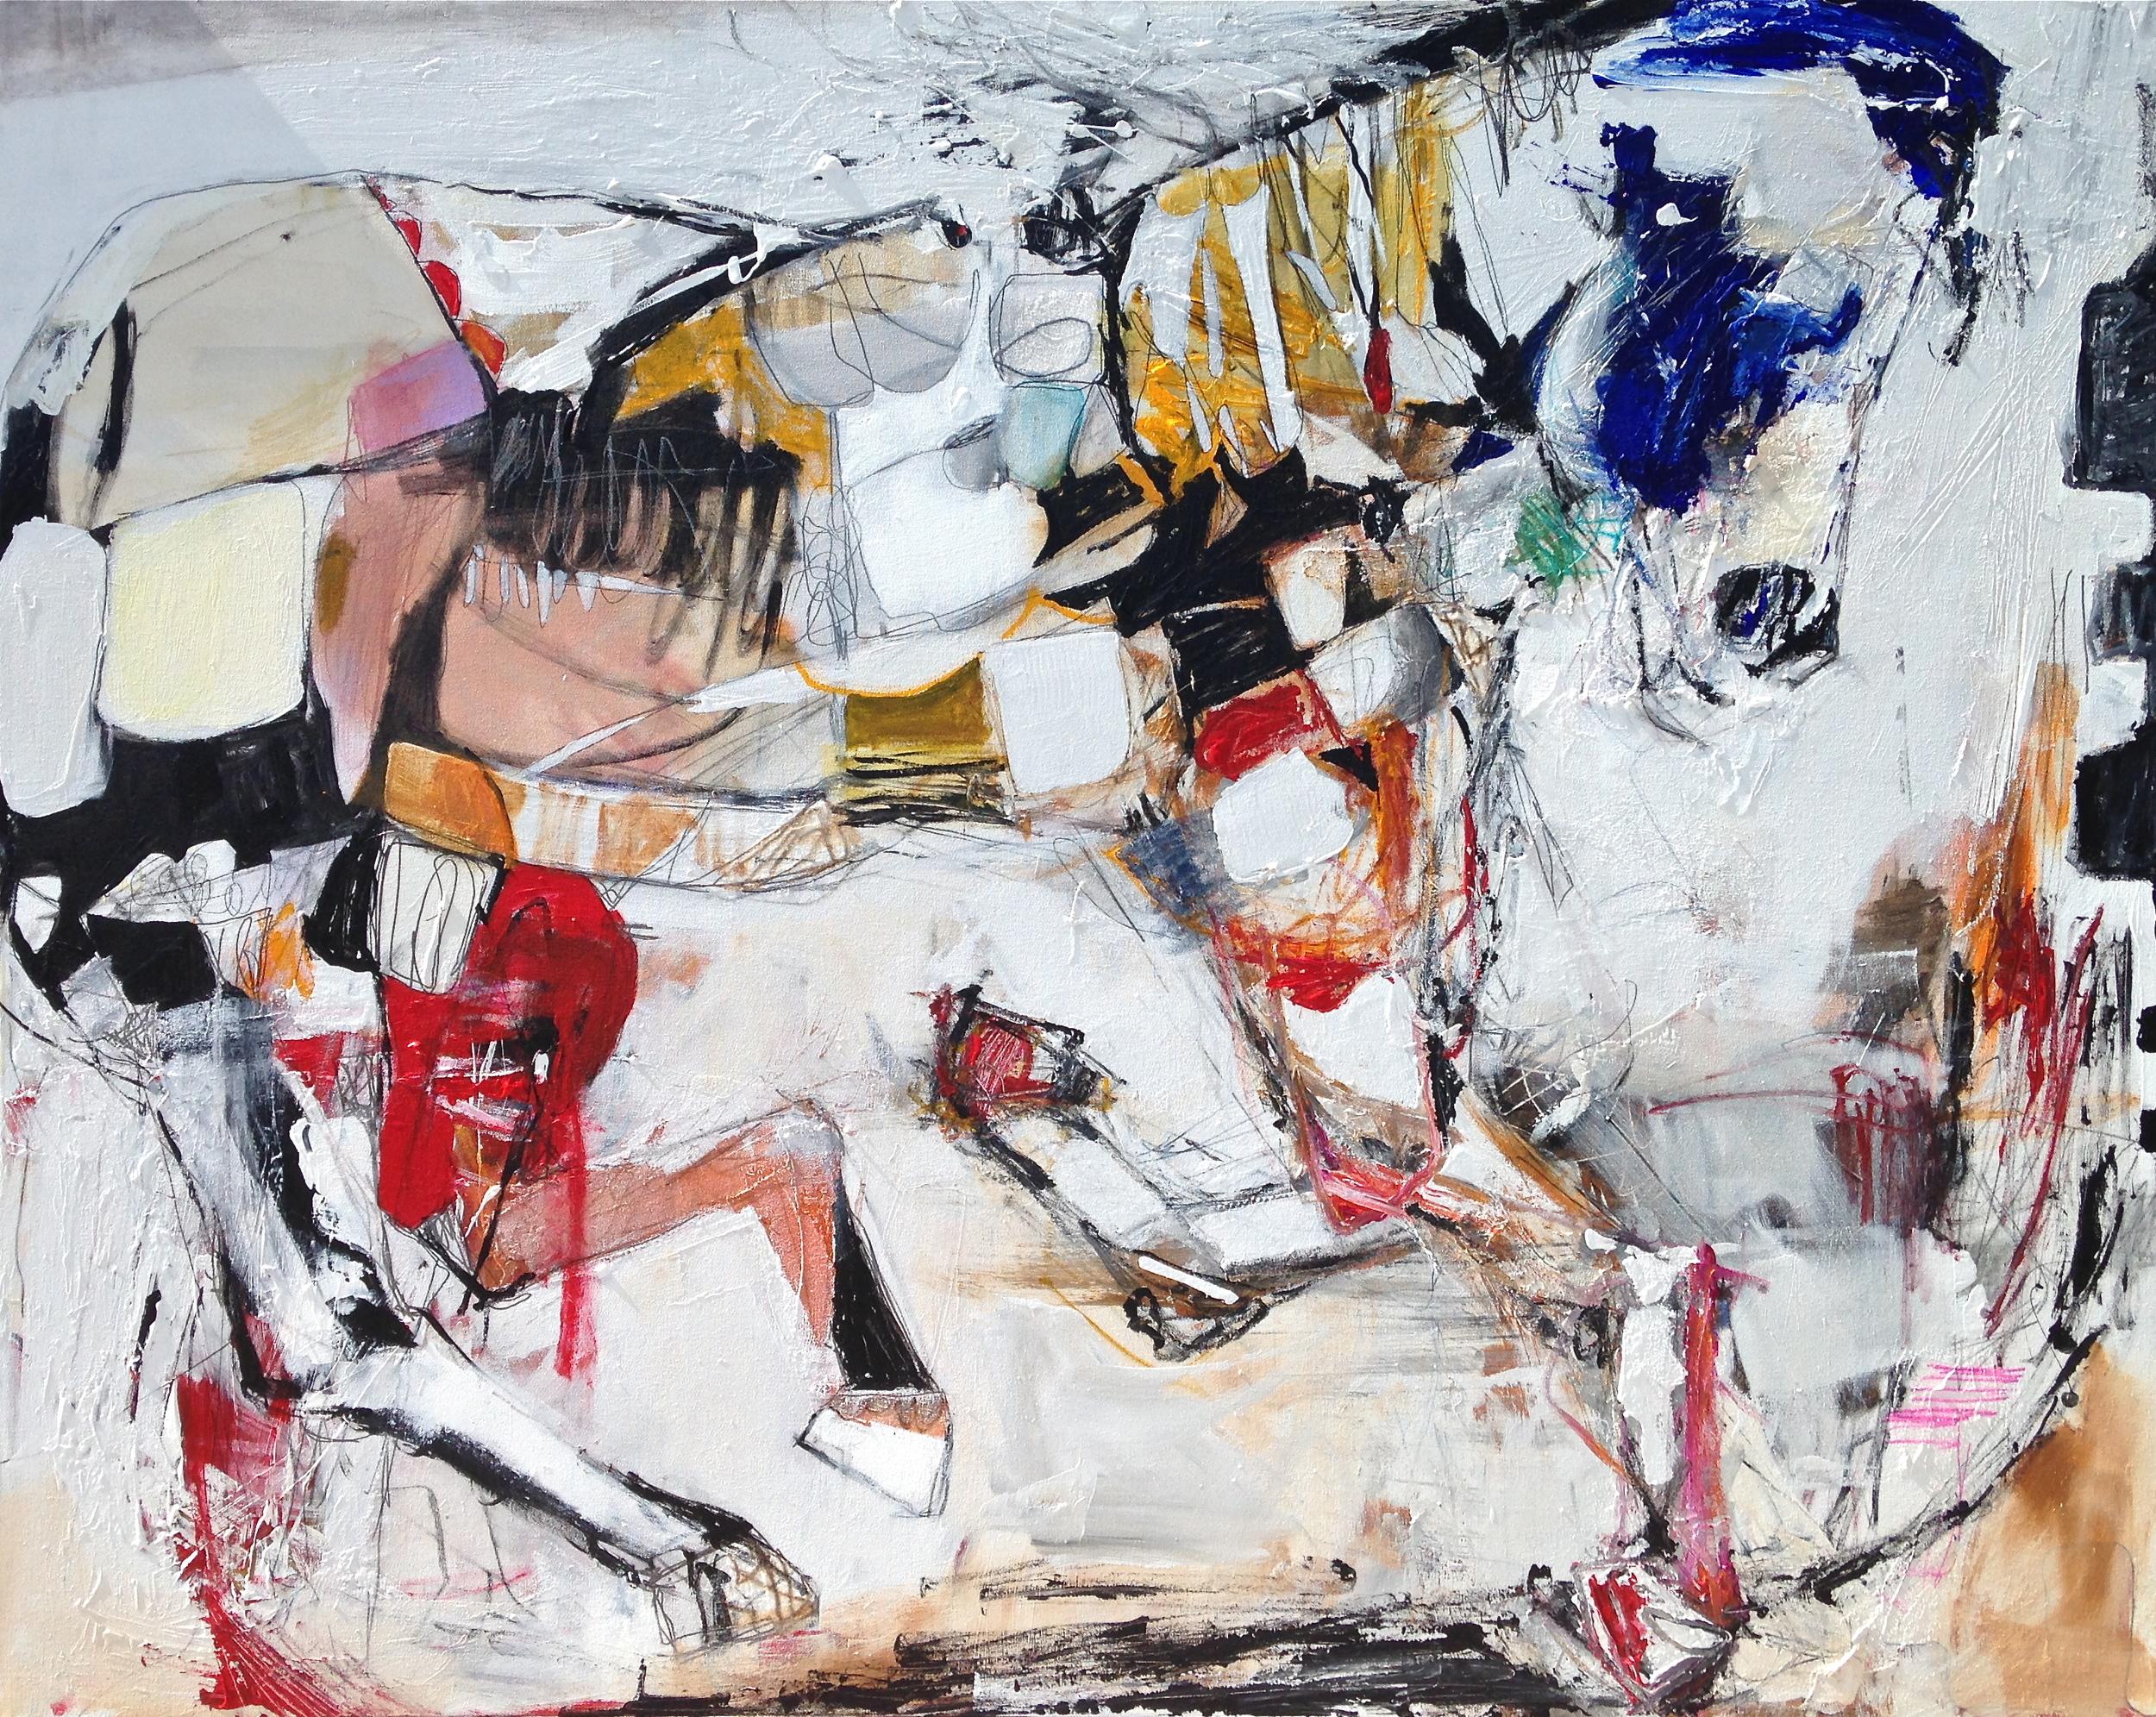 """Breaking Binds"" Acrylic on canvas 48""x60"" $6,400"